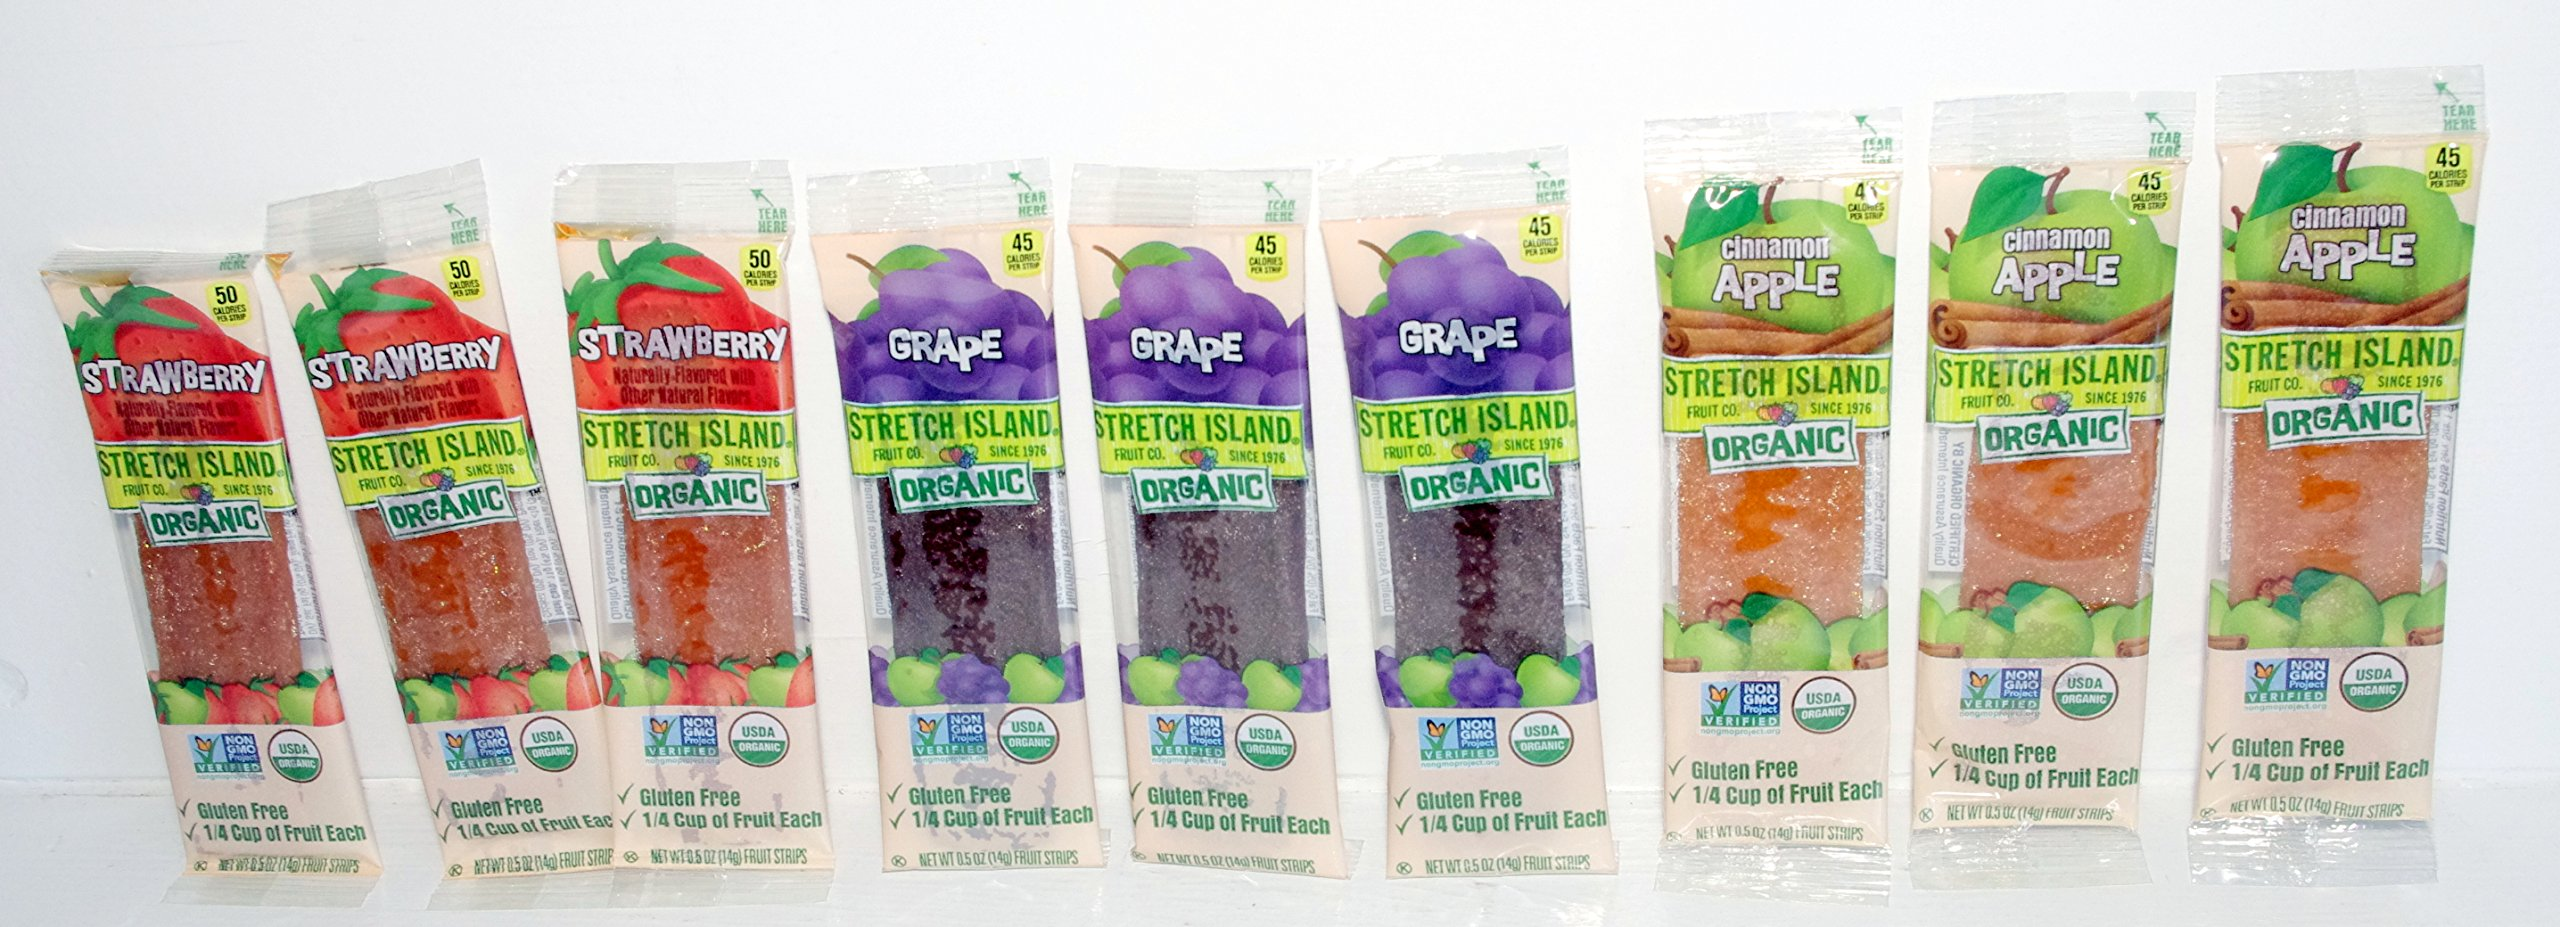 Organic All-natural Fruit Strips - 9 (.5 Oz.) Pkgs. Grape, Cinnamon Apple & Strawberry